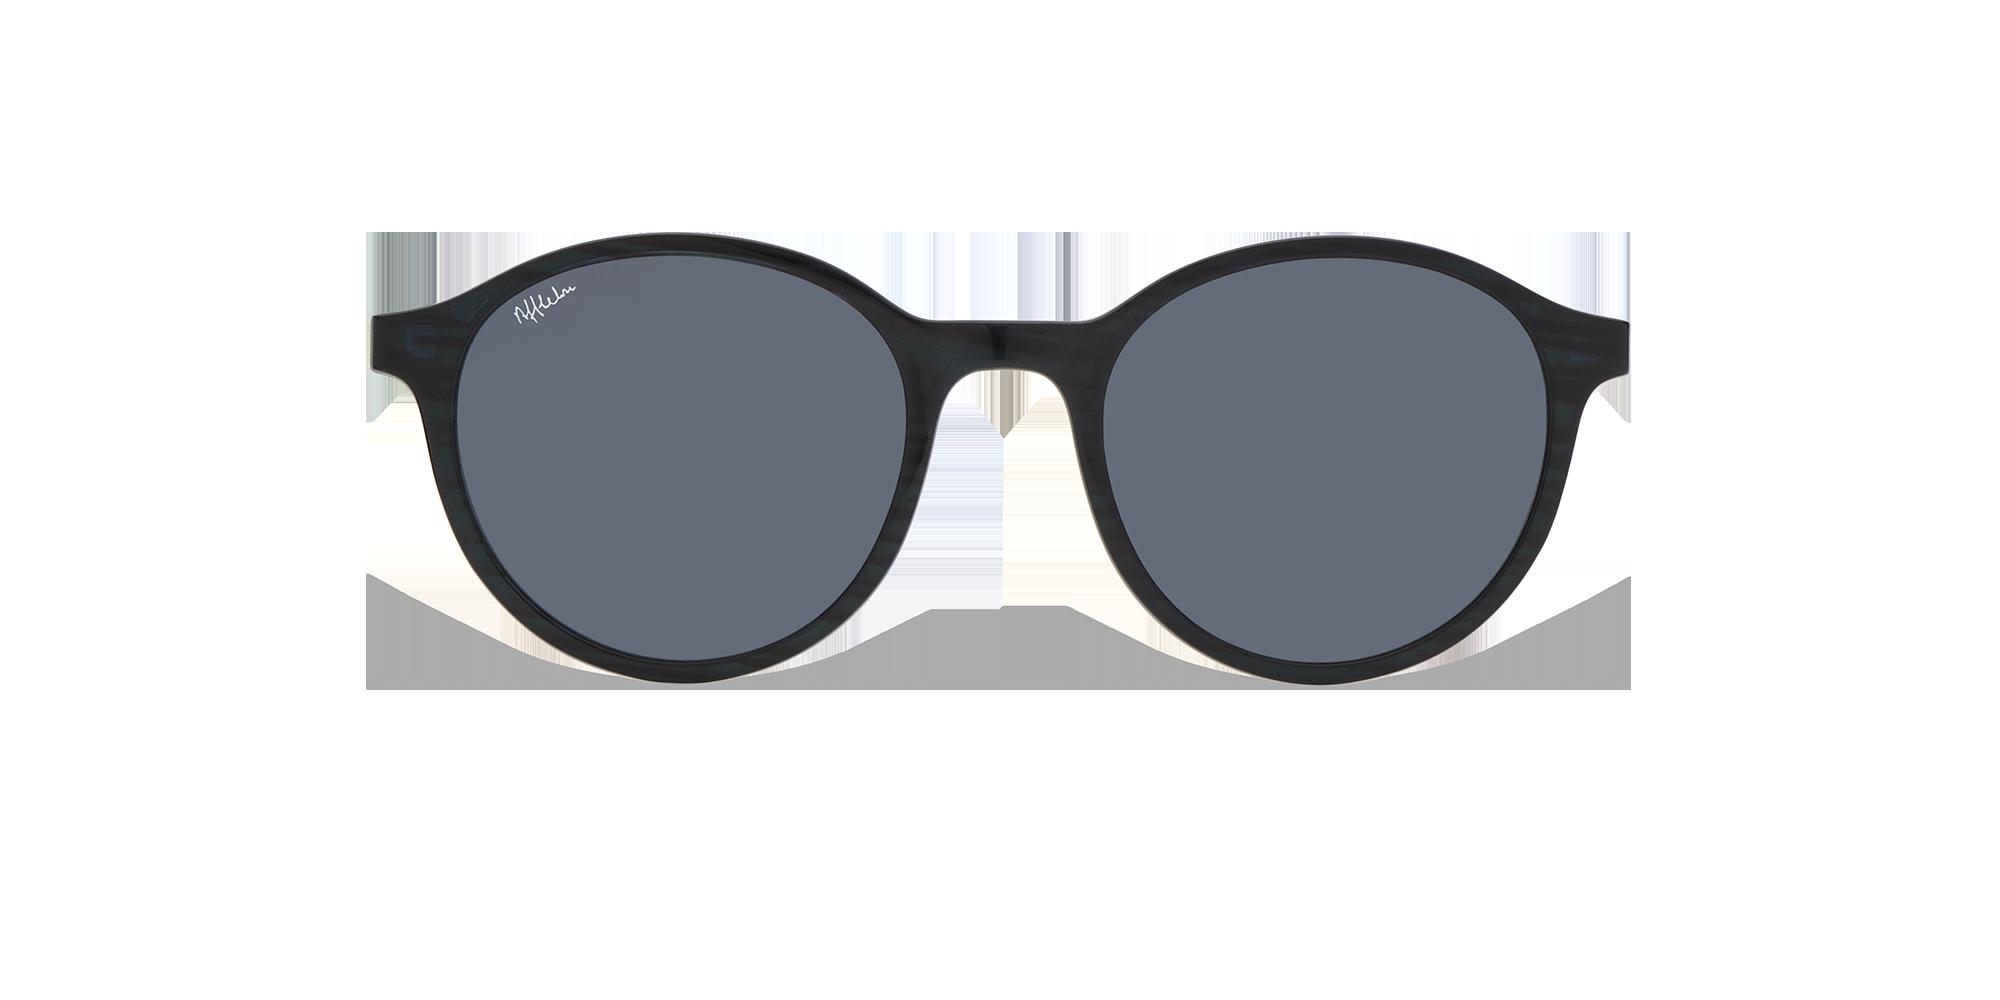 afflelou/france/products/smart_clip/clips_glasses/TMK37SUGR014919.png